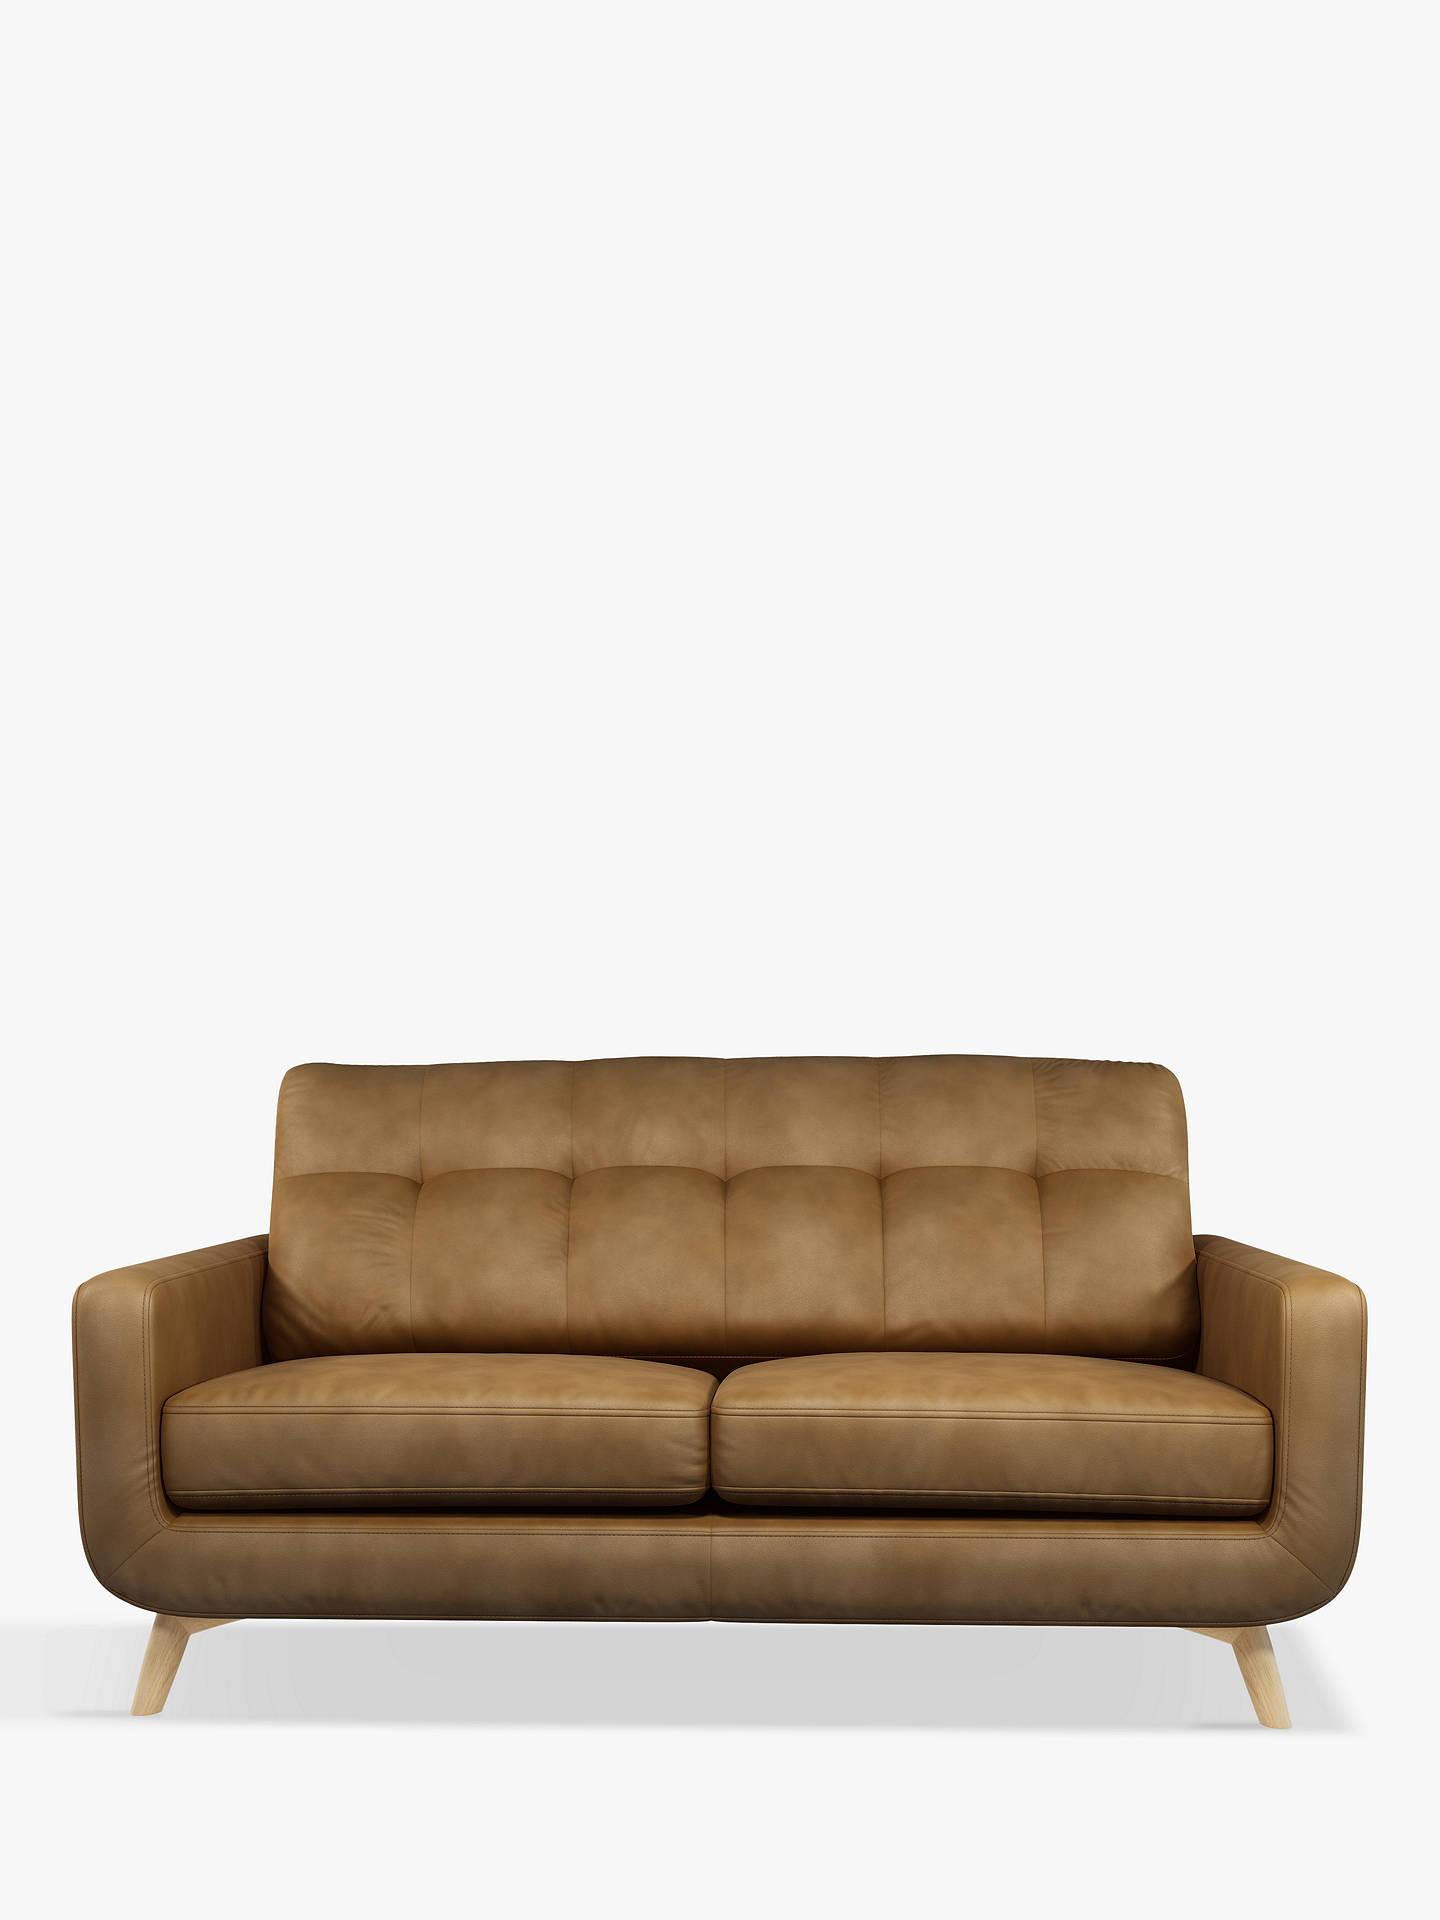 John Lewis Partners Barbican Medium 2 Seater Leather Sofa Light Leg Demetra